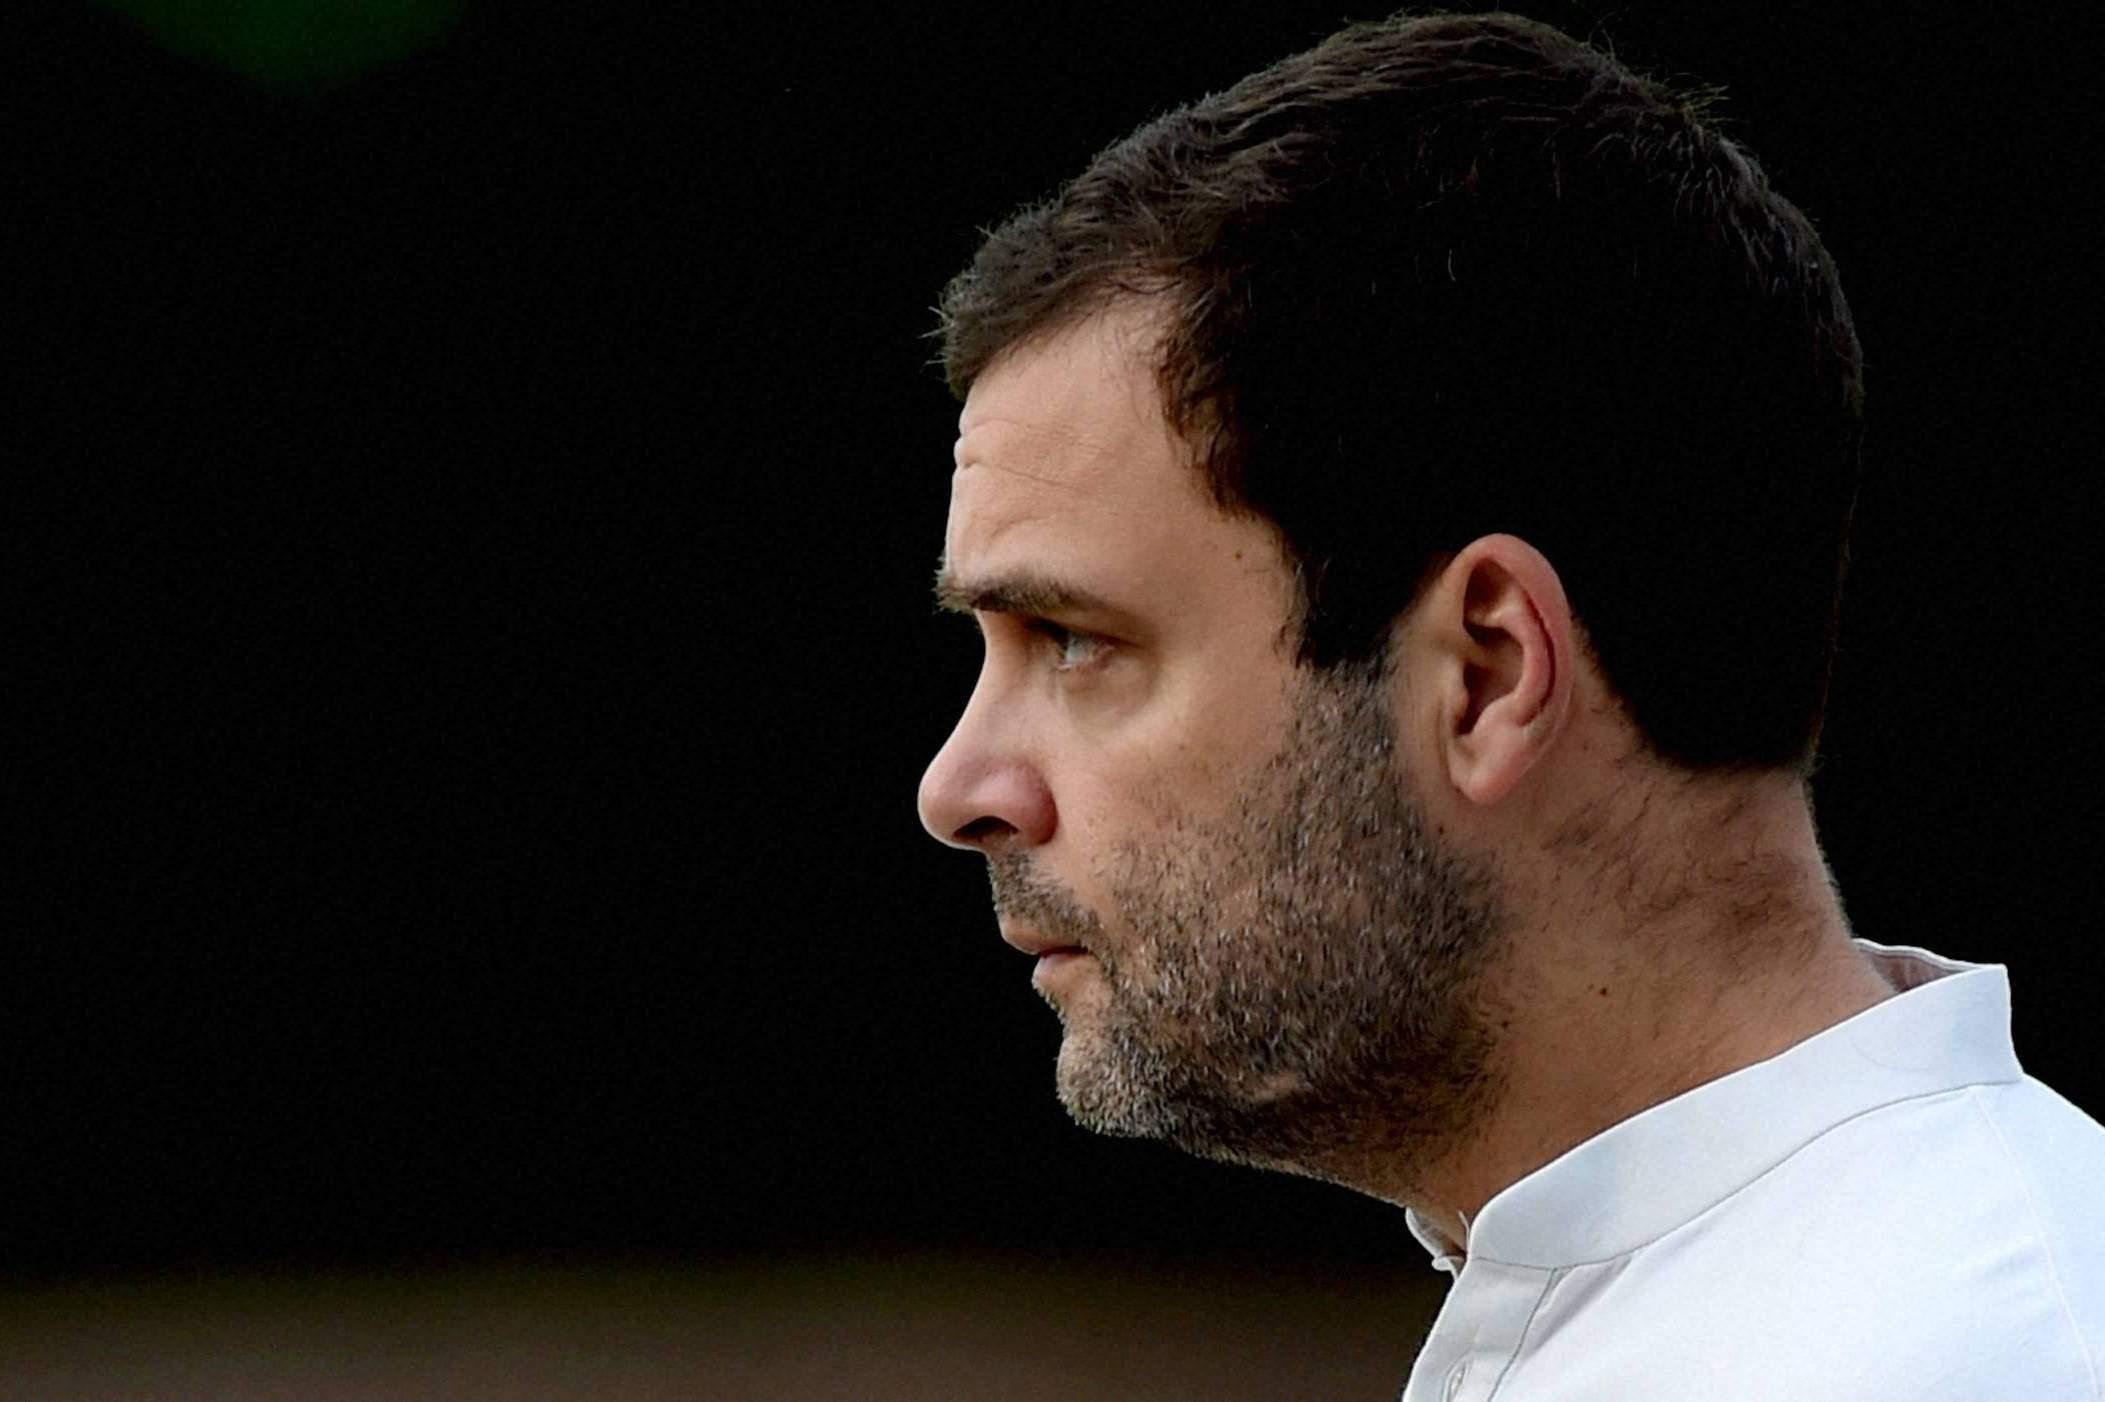 कांग्रेस उपाध्यक्ष राहुल गांधी. (फोटो: पीटीआई)